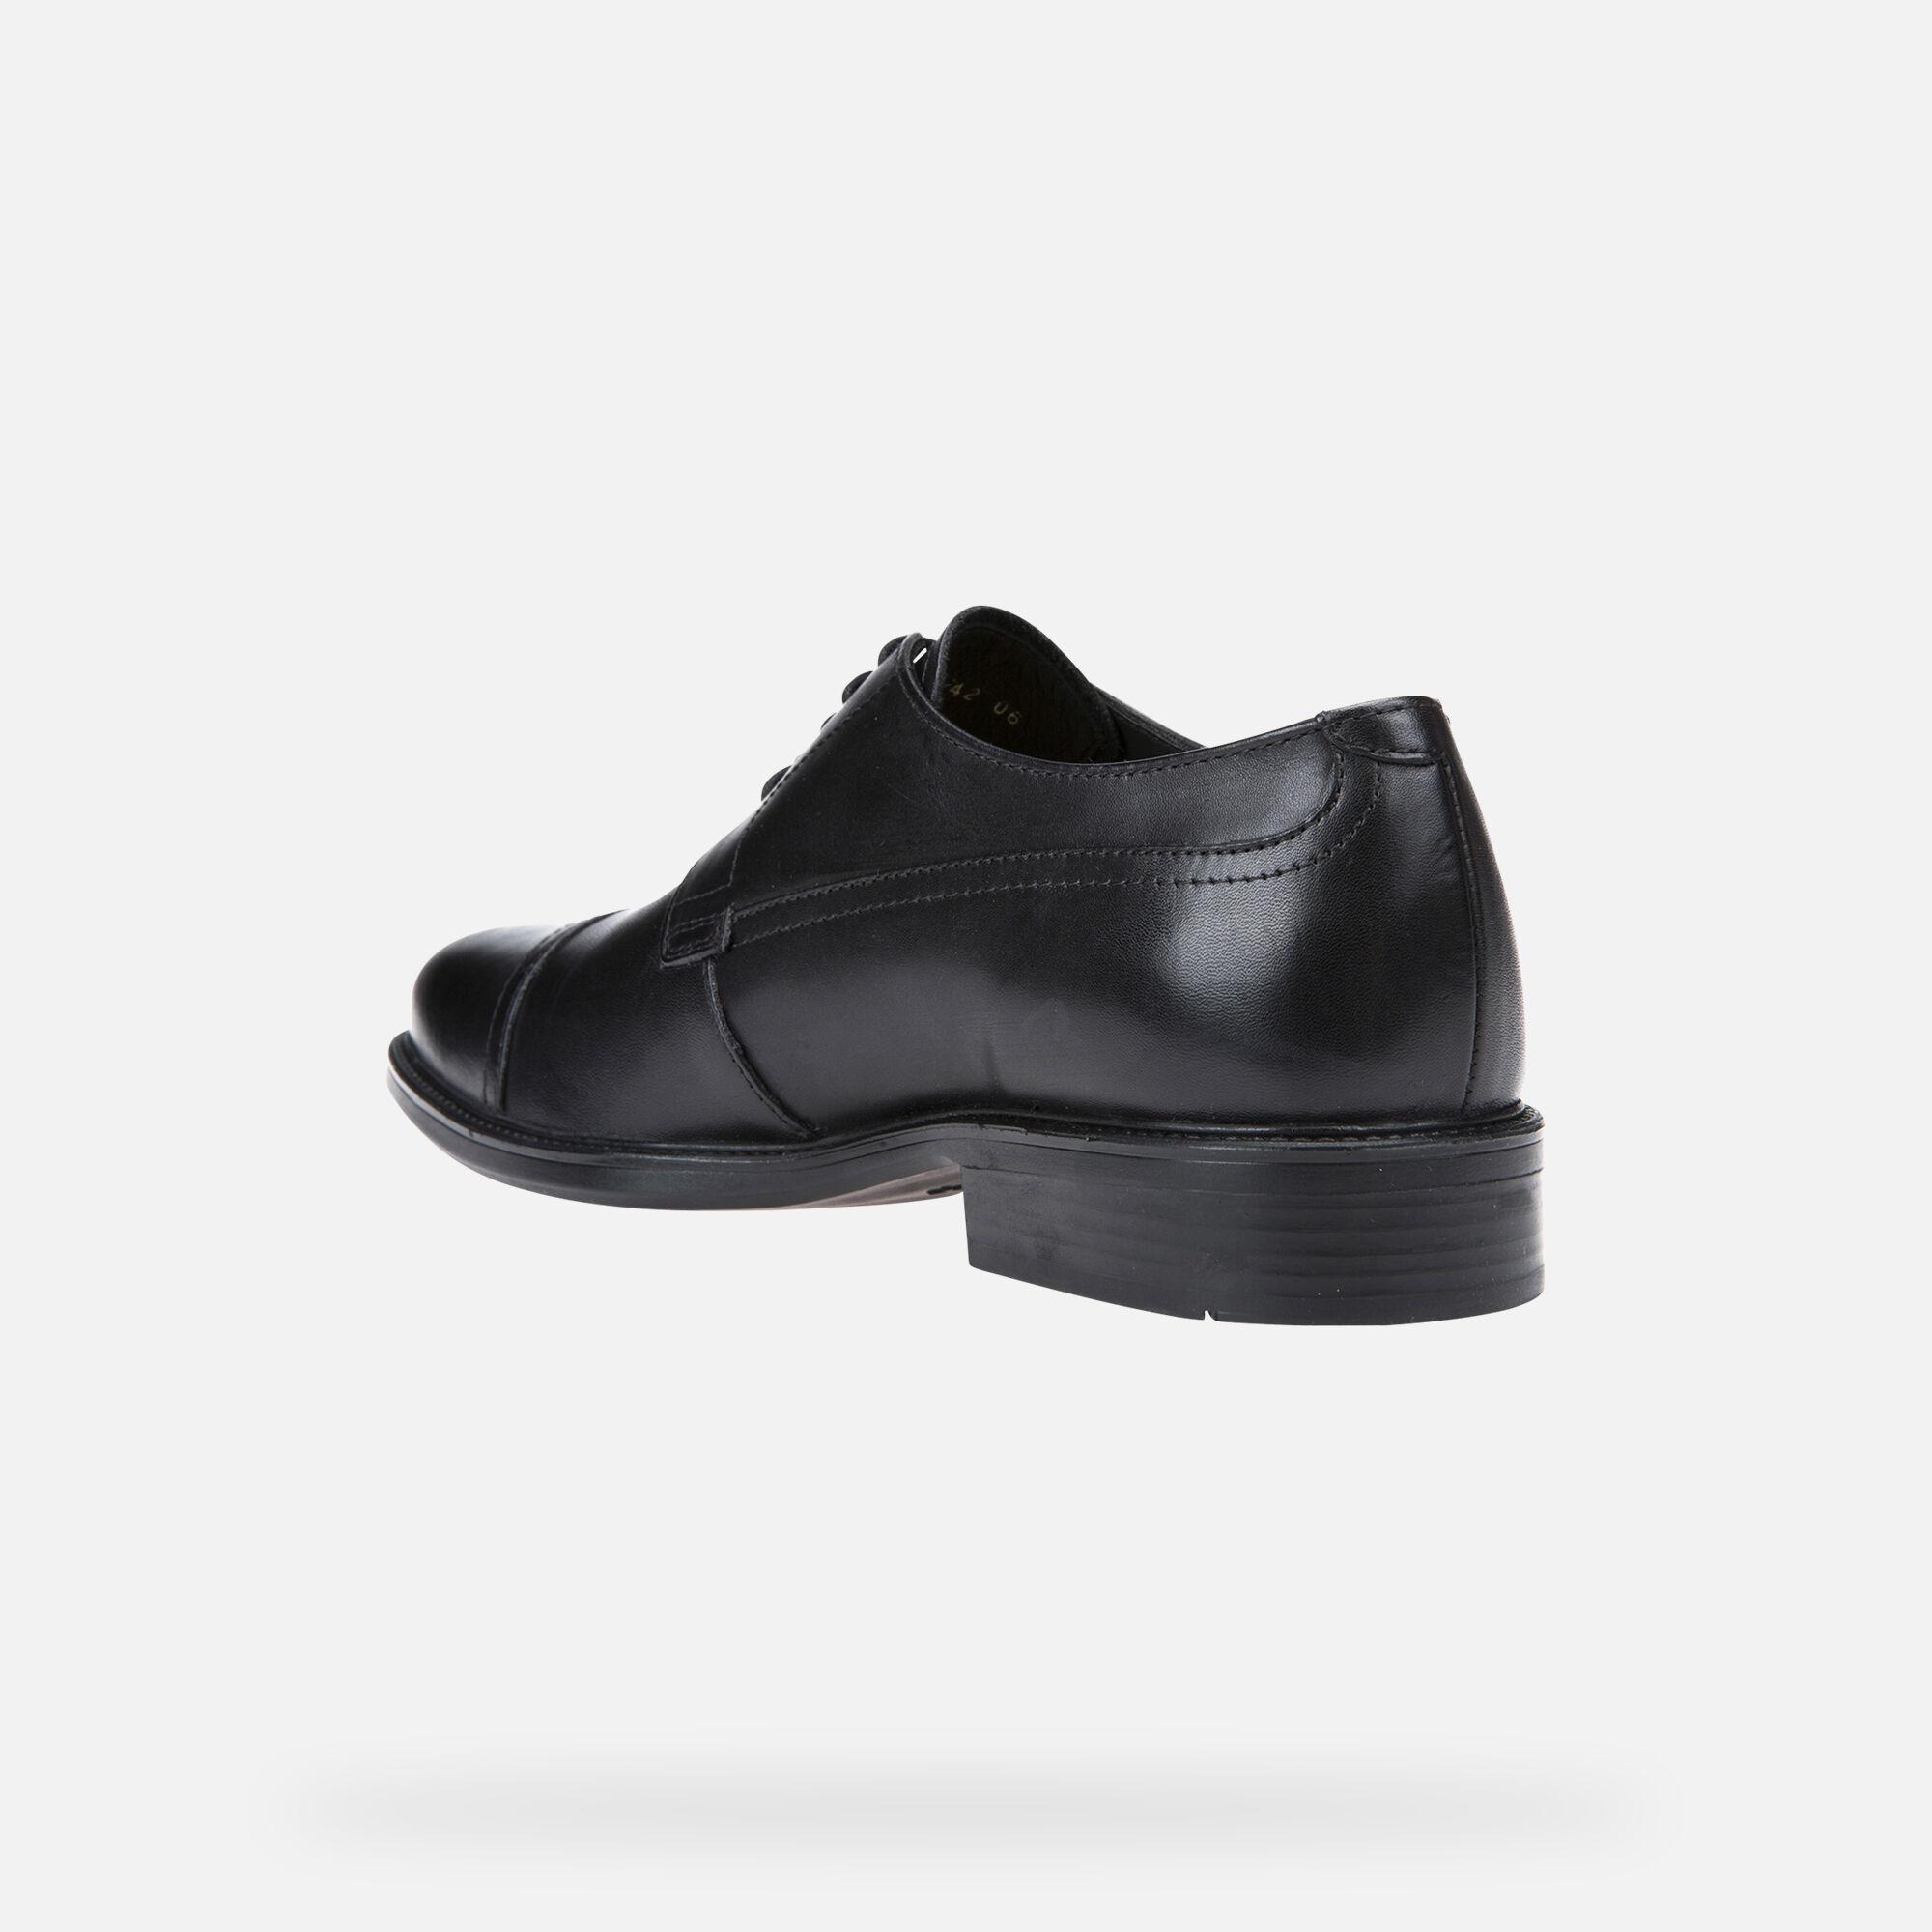 Geox CARNABY Scarpe Eleganti Nere Uomo   Geox® Online store